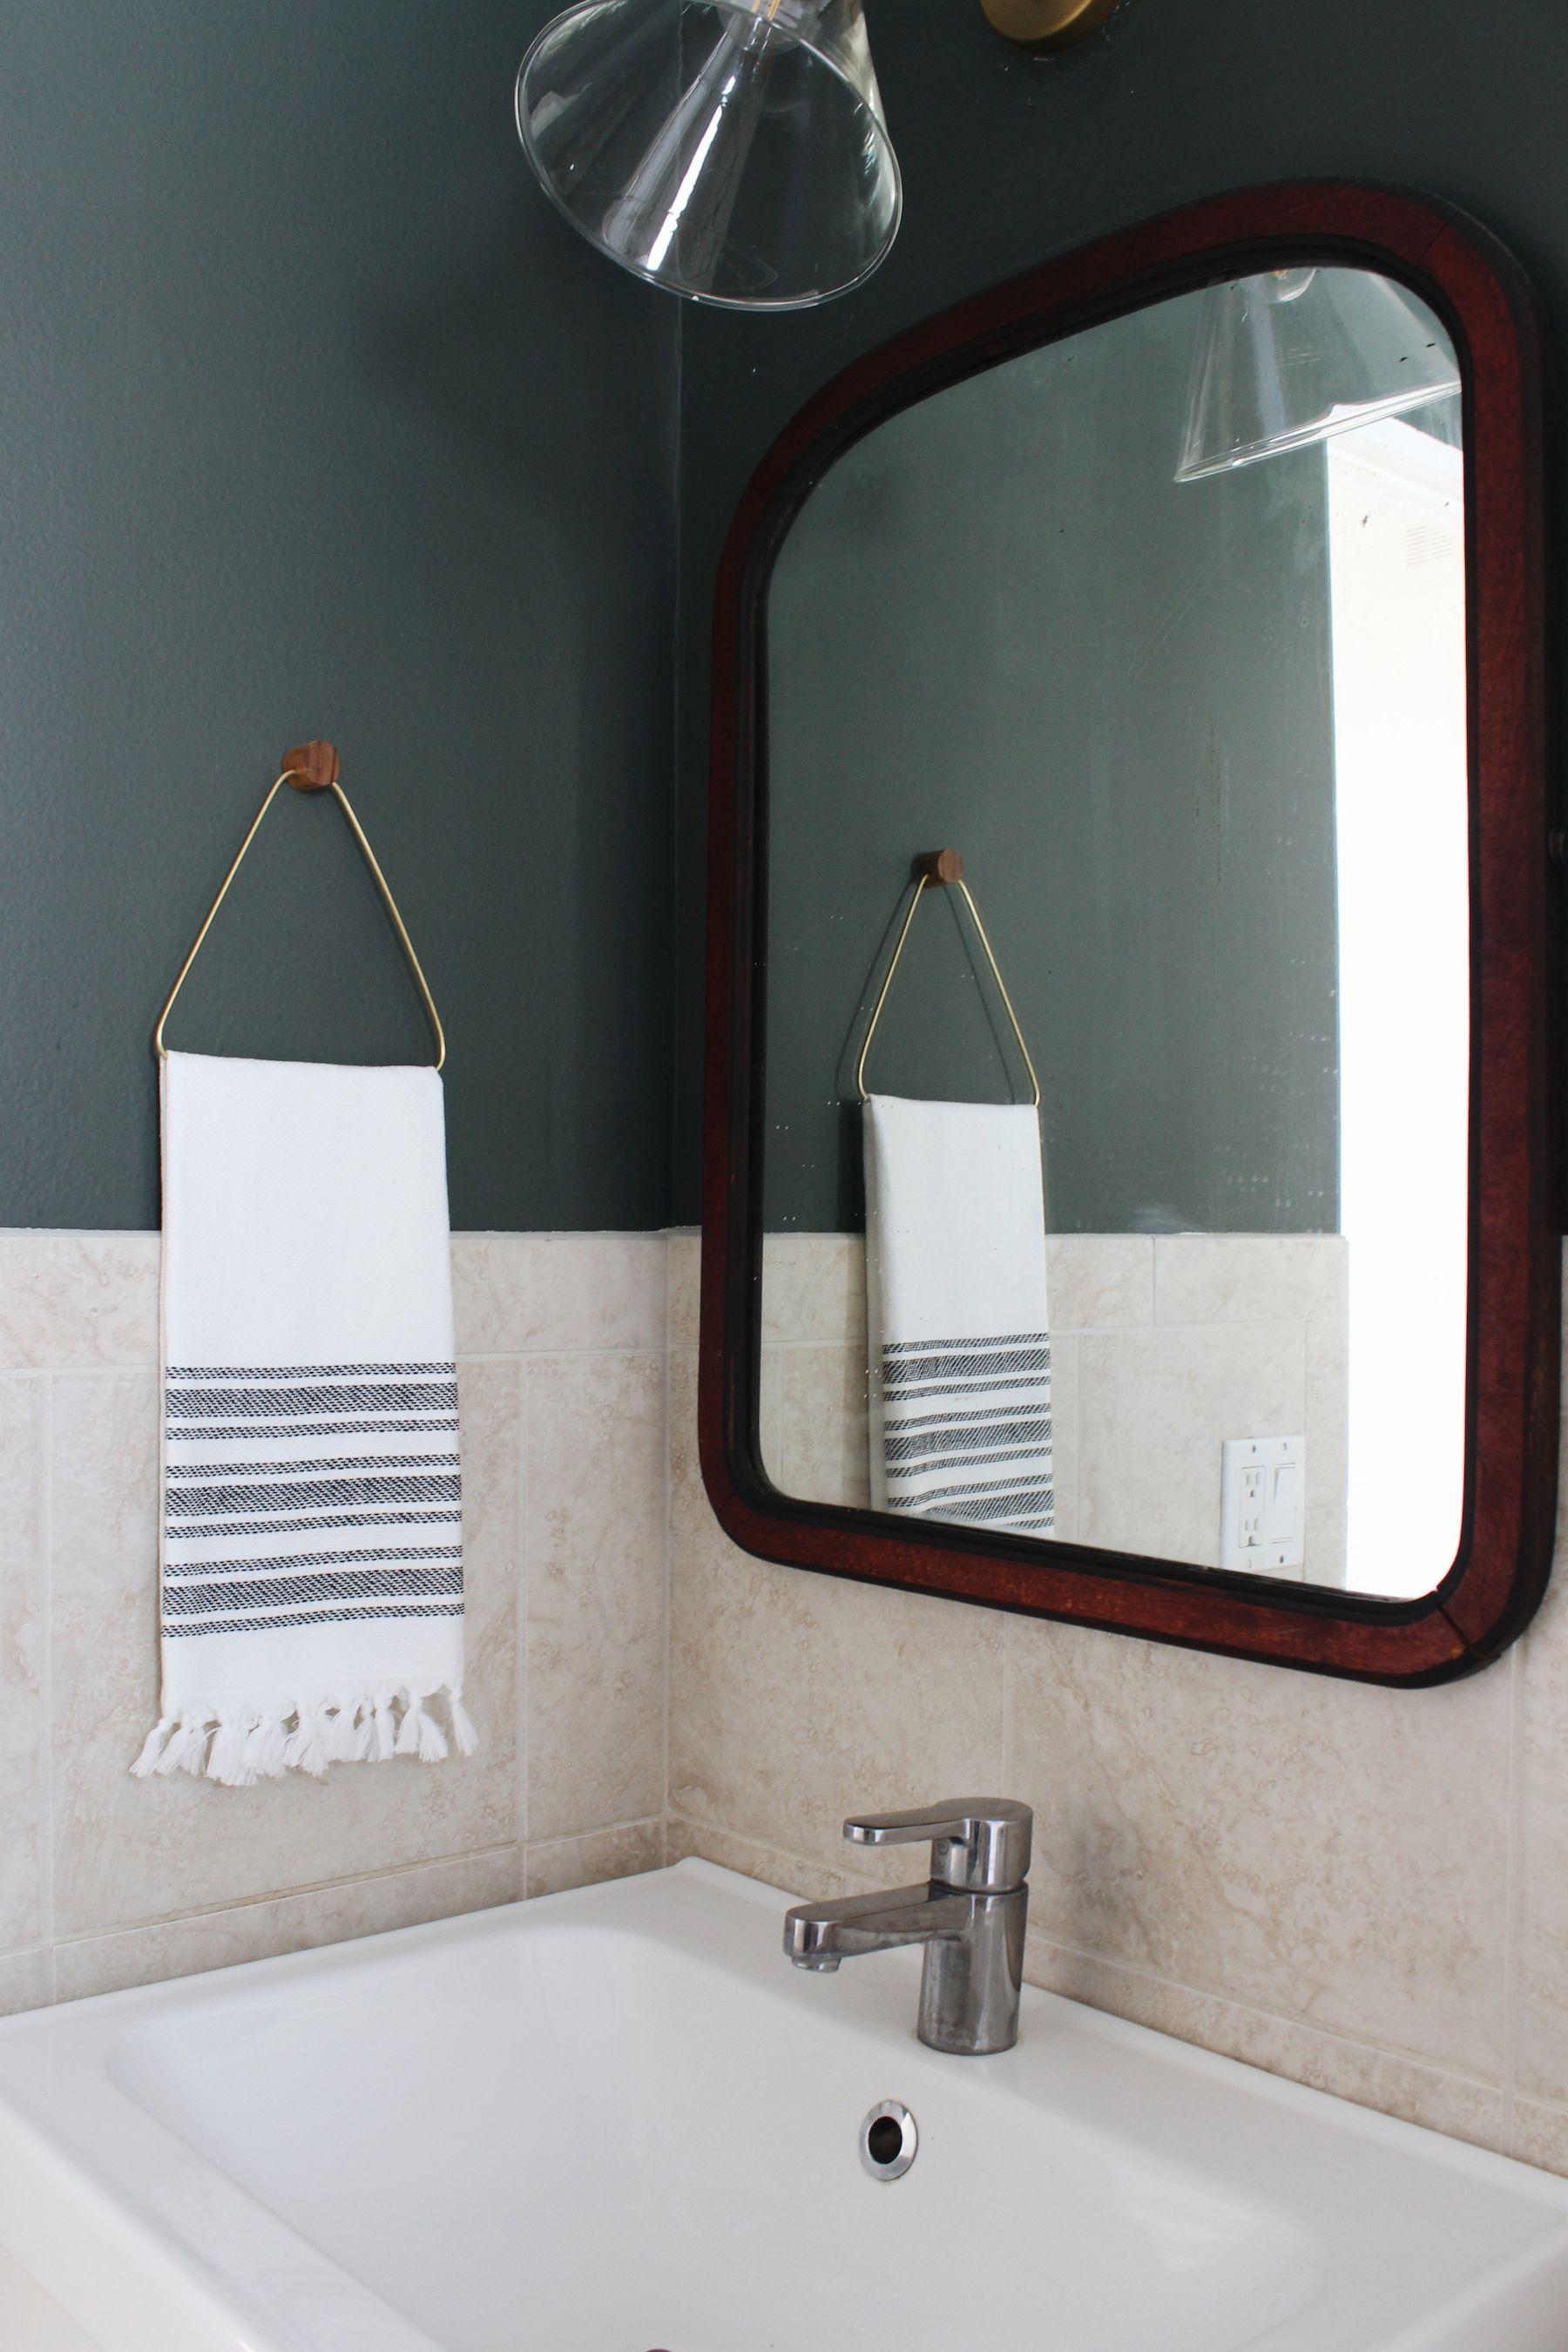 Diy Brass Hand Towel Holder Turning It Home Hand Towel Holder Bathroom Hand Towel Holder Hand Towels Bathroom